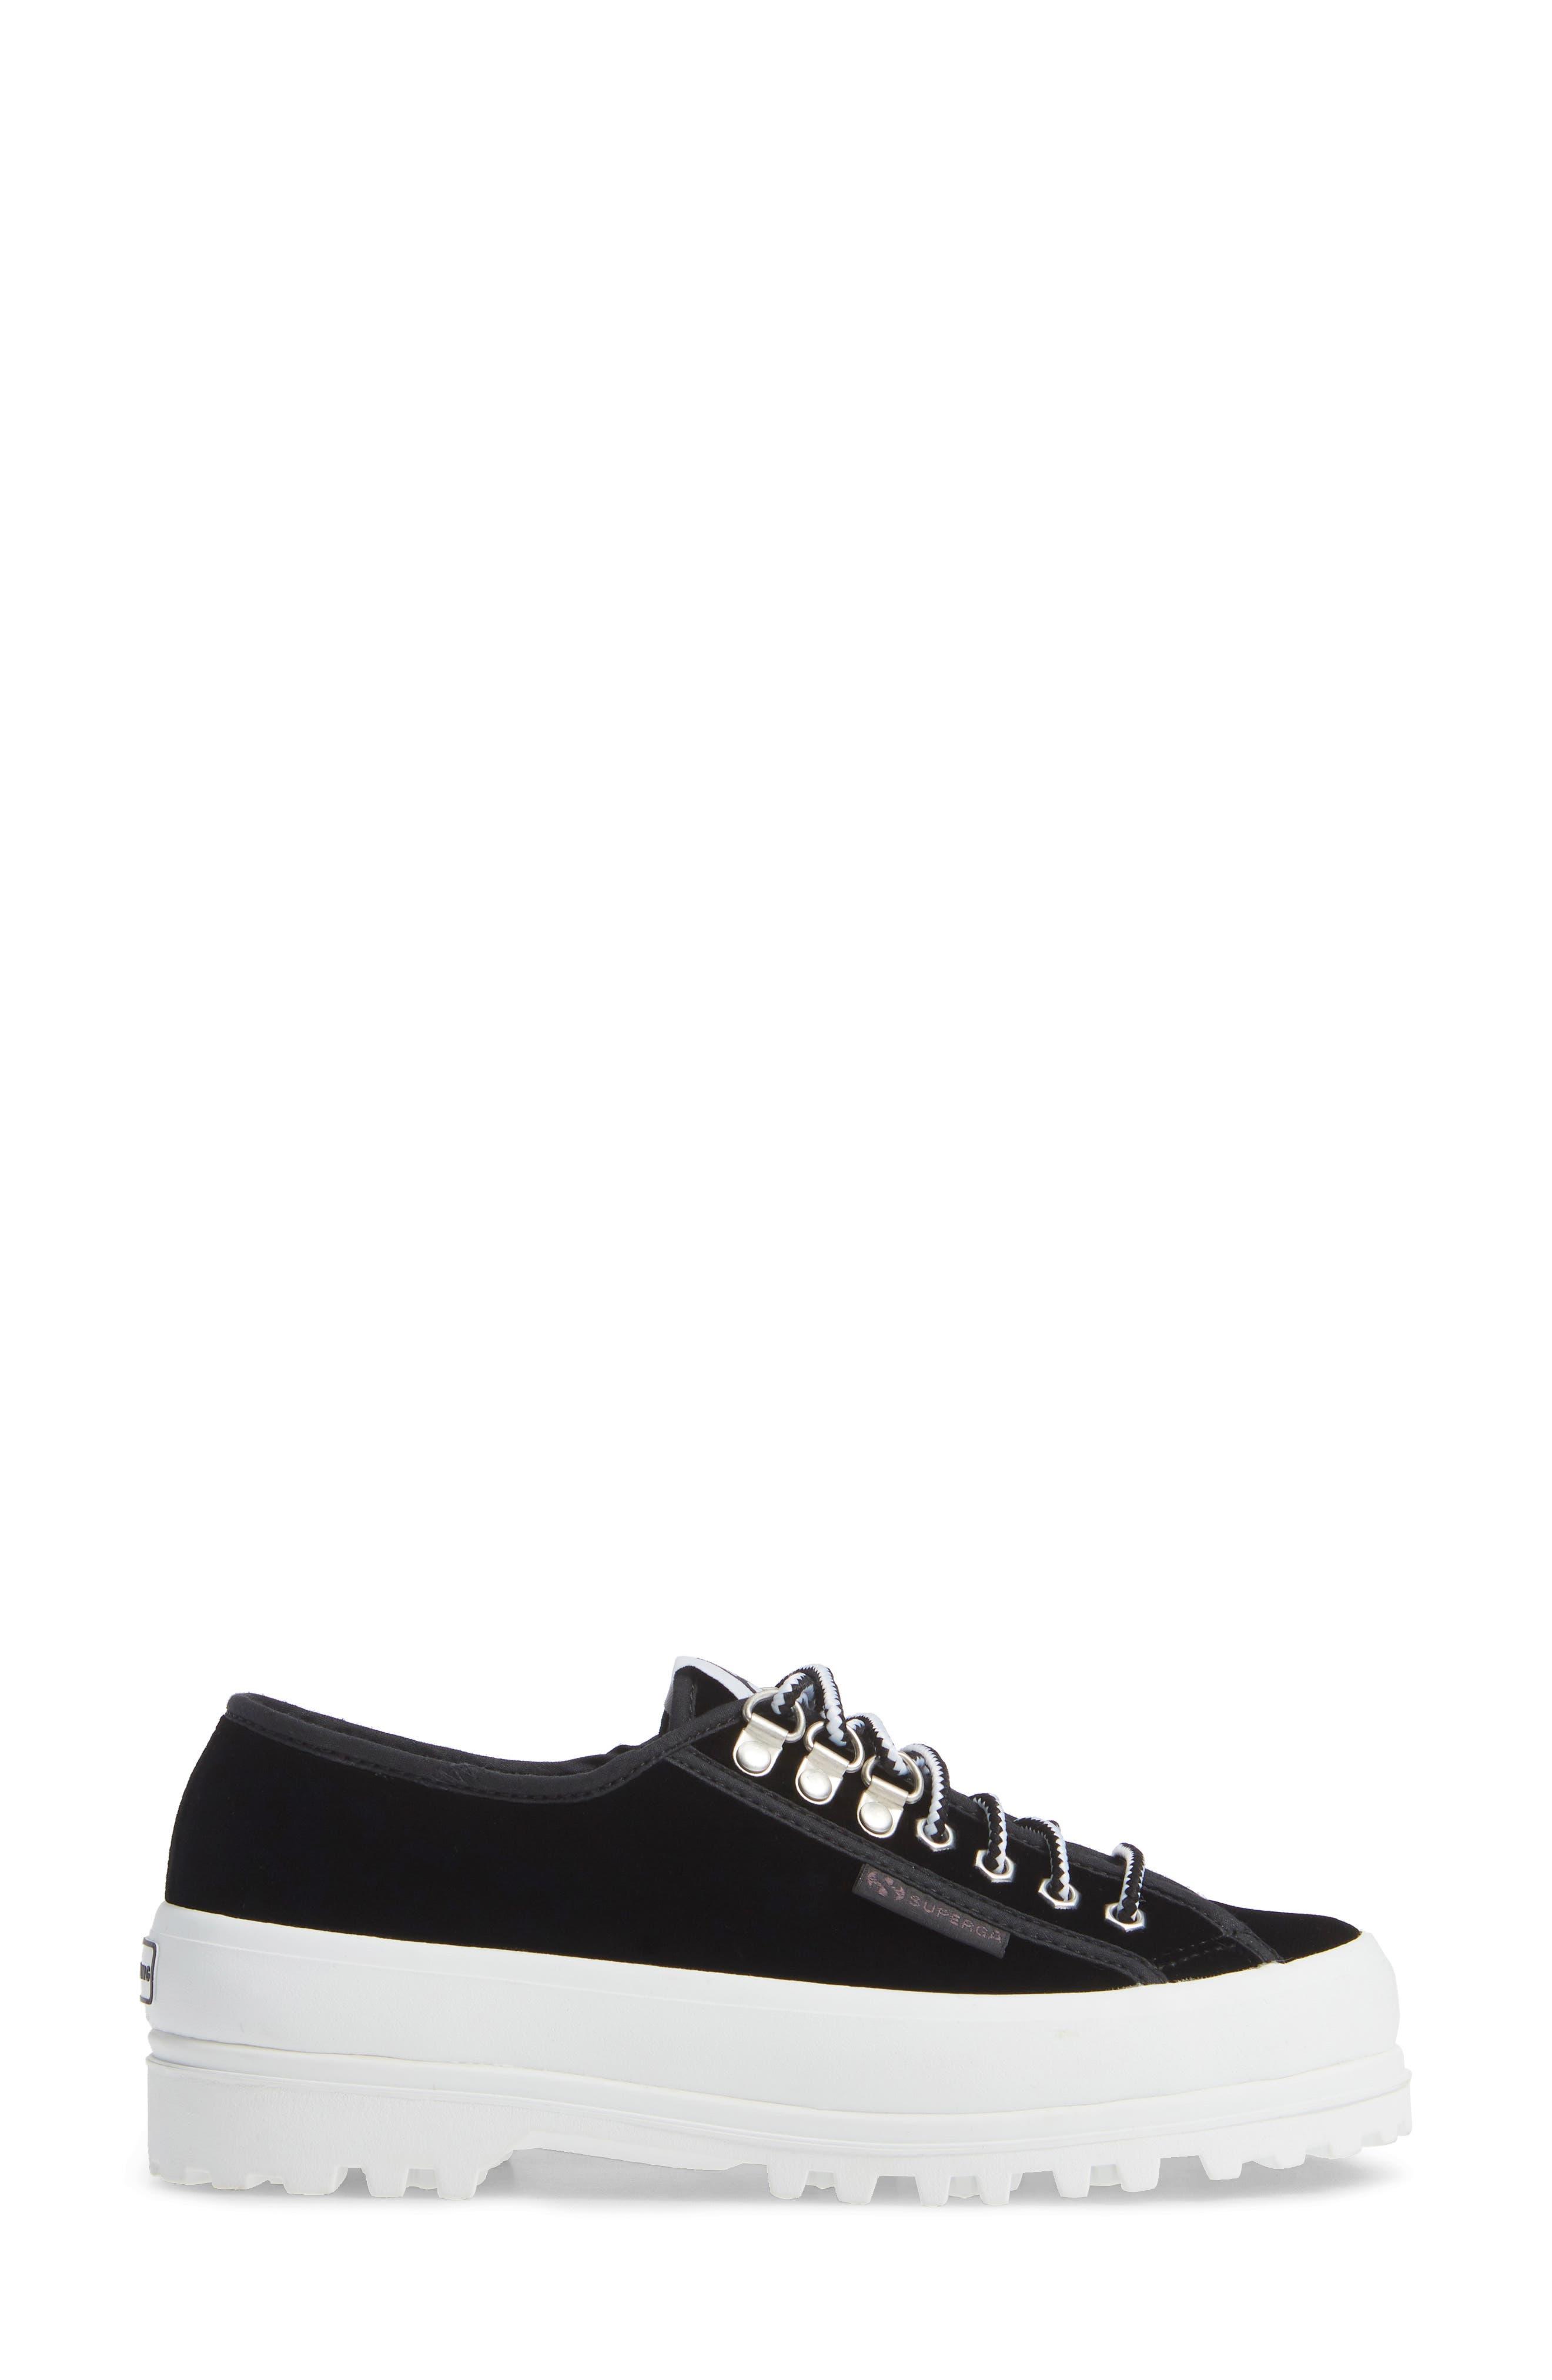 x Alexa Chung 2748 Veltvalpinaw Lugged Platform Sneaker,                             Alternate thumbnail 3, color,                             001